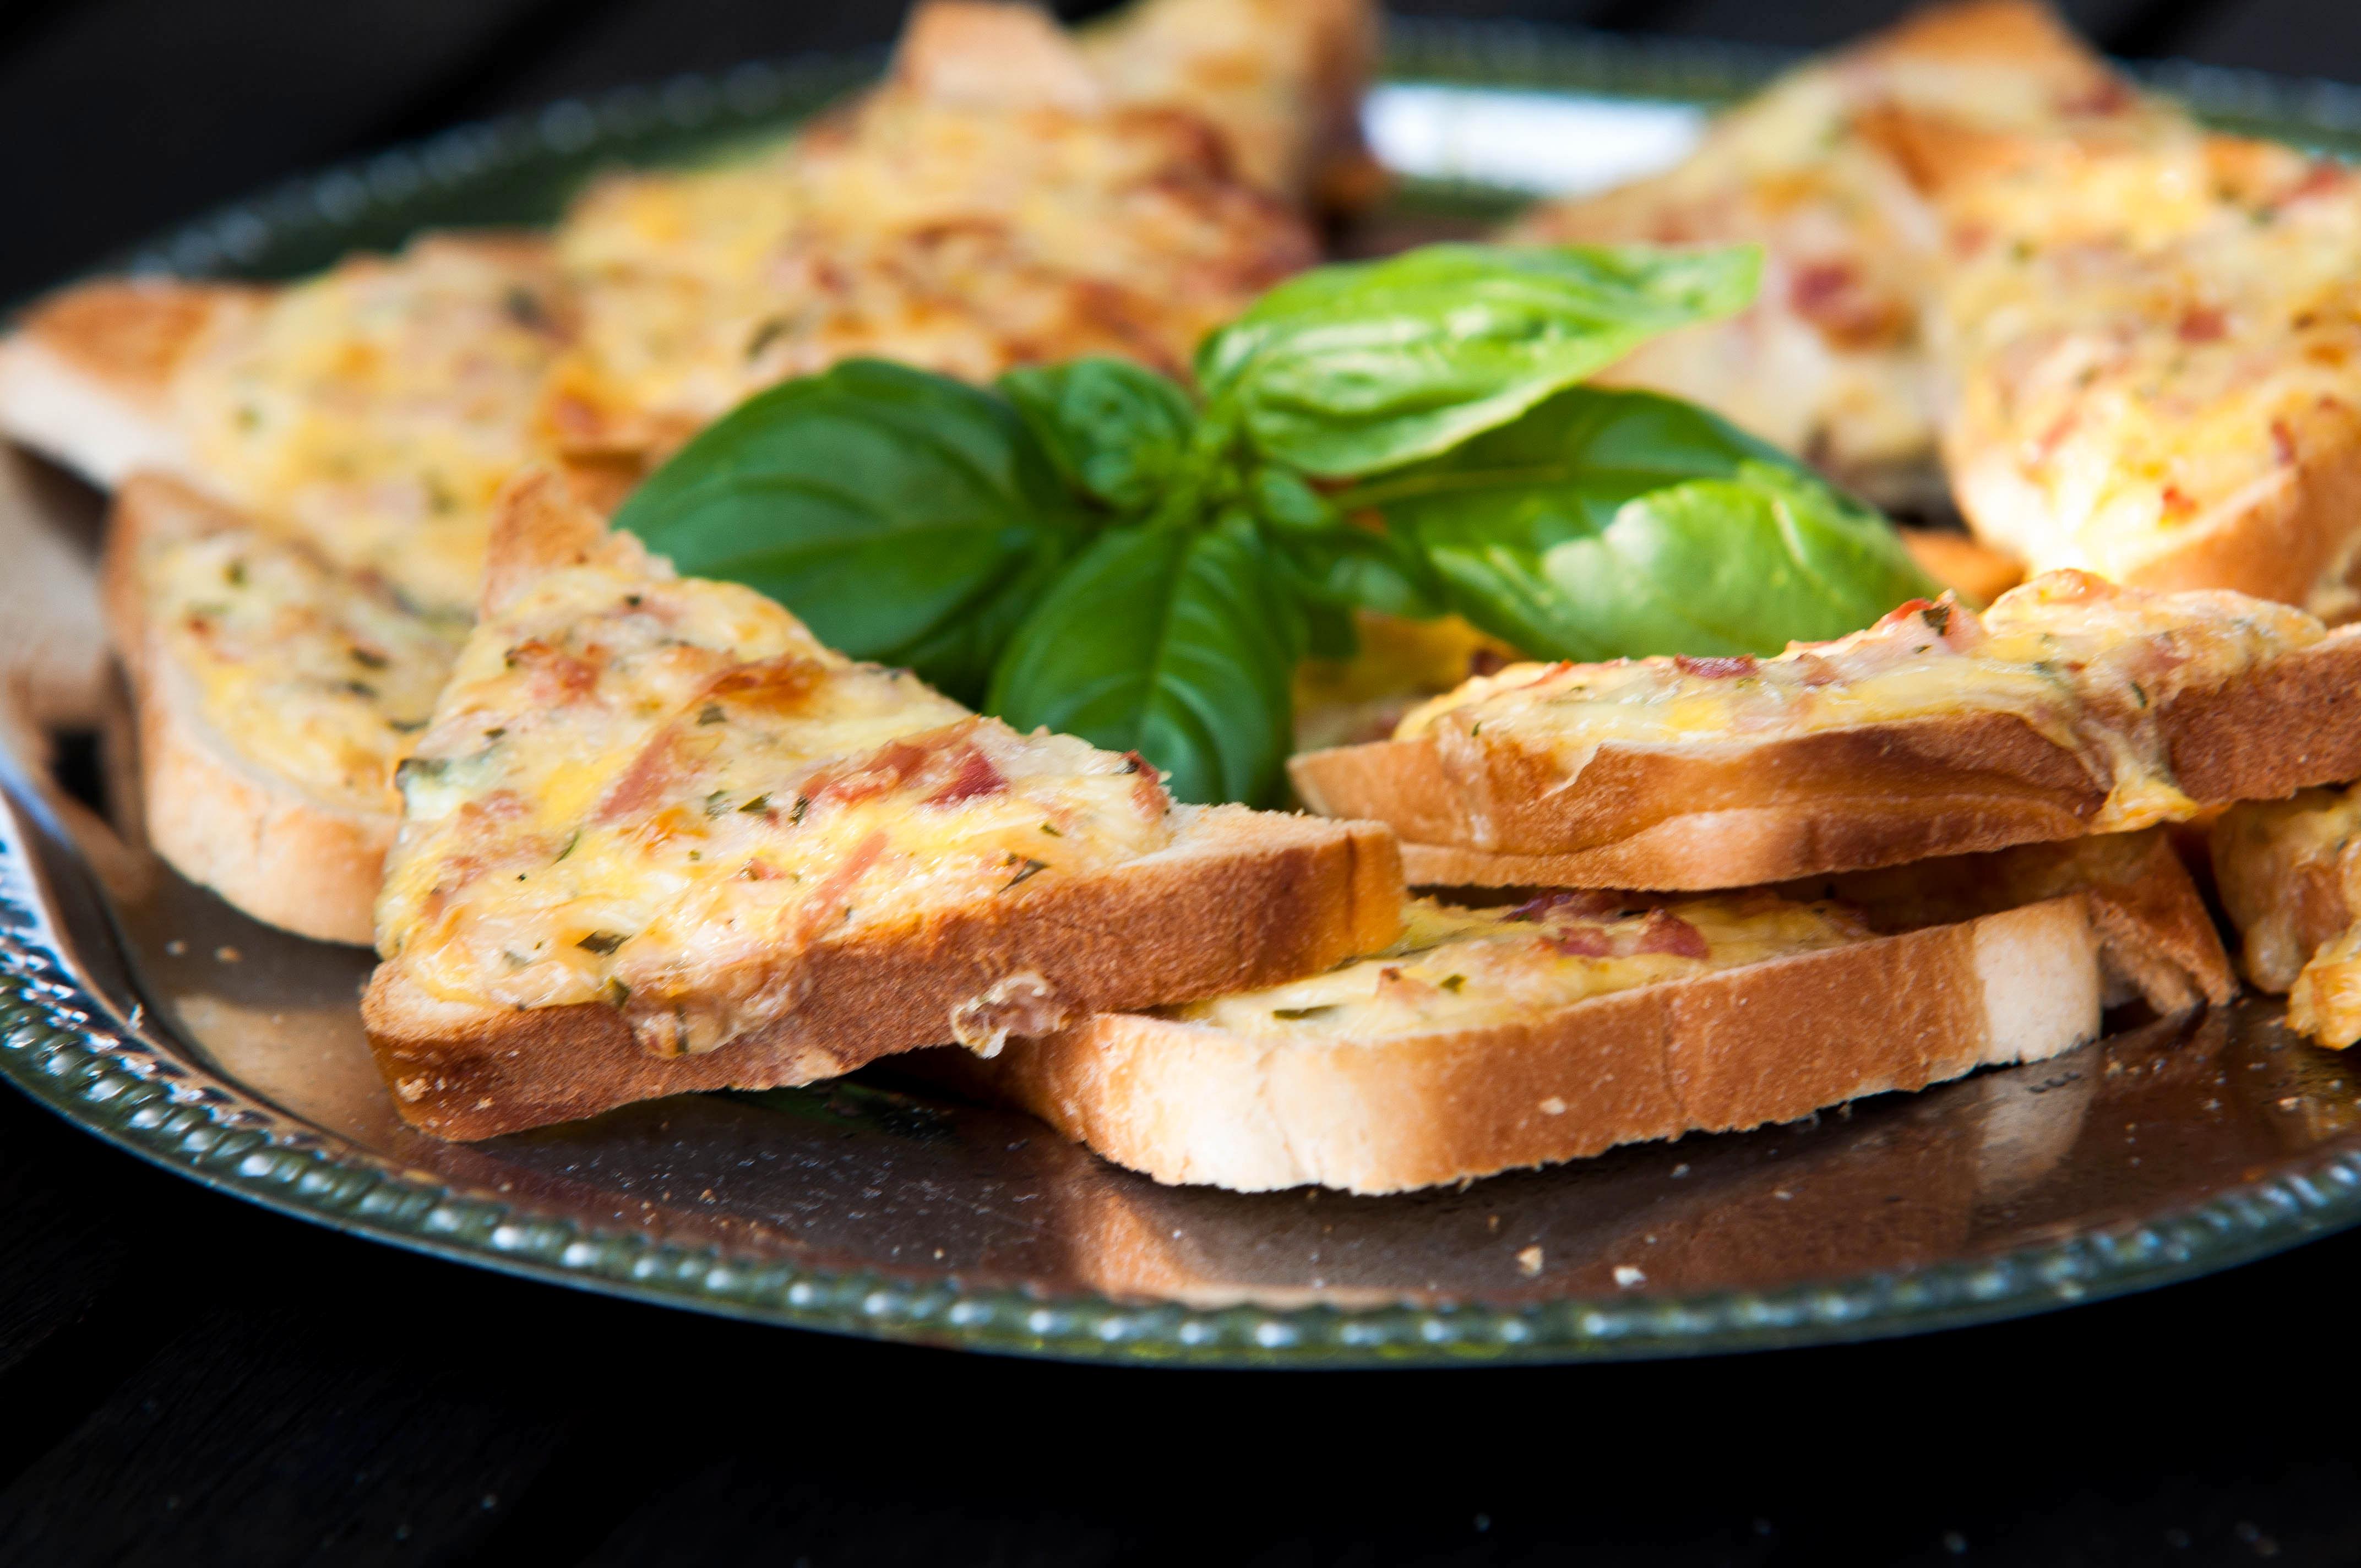 Lidjia's Sandwiches